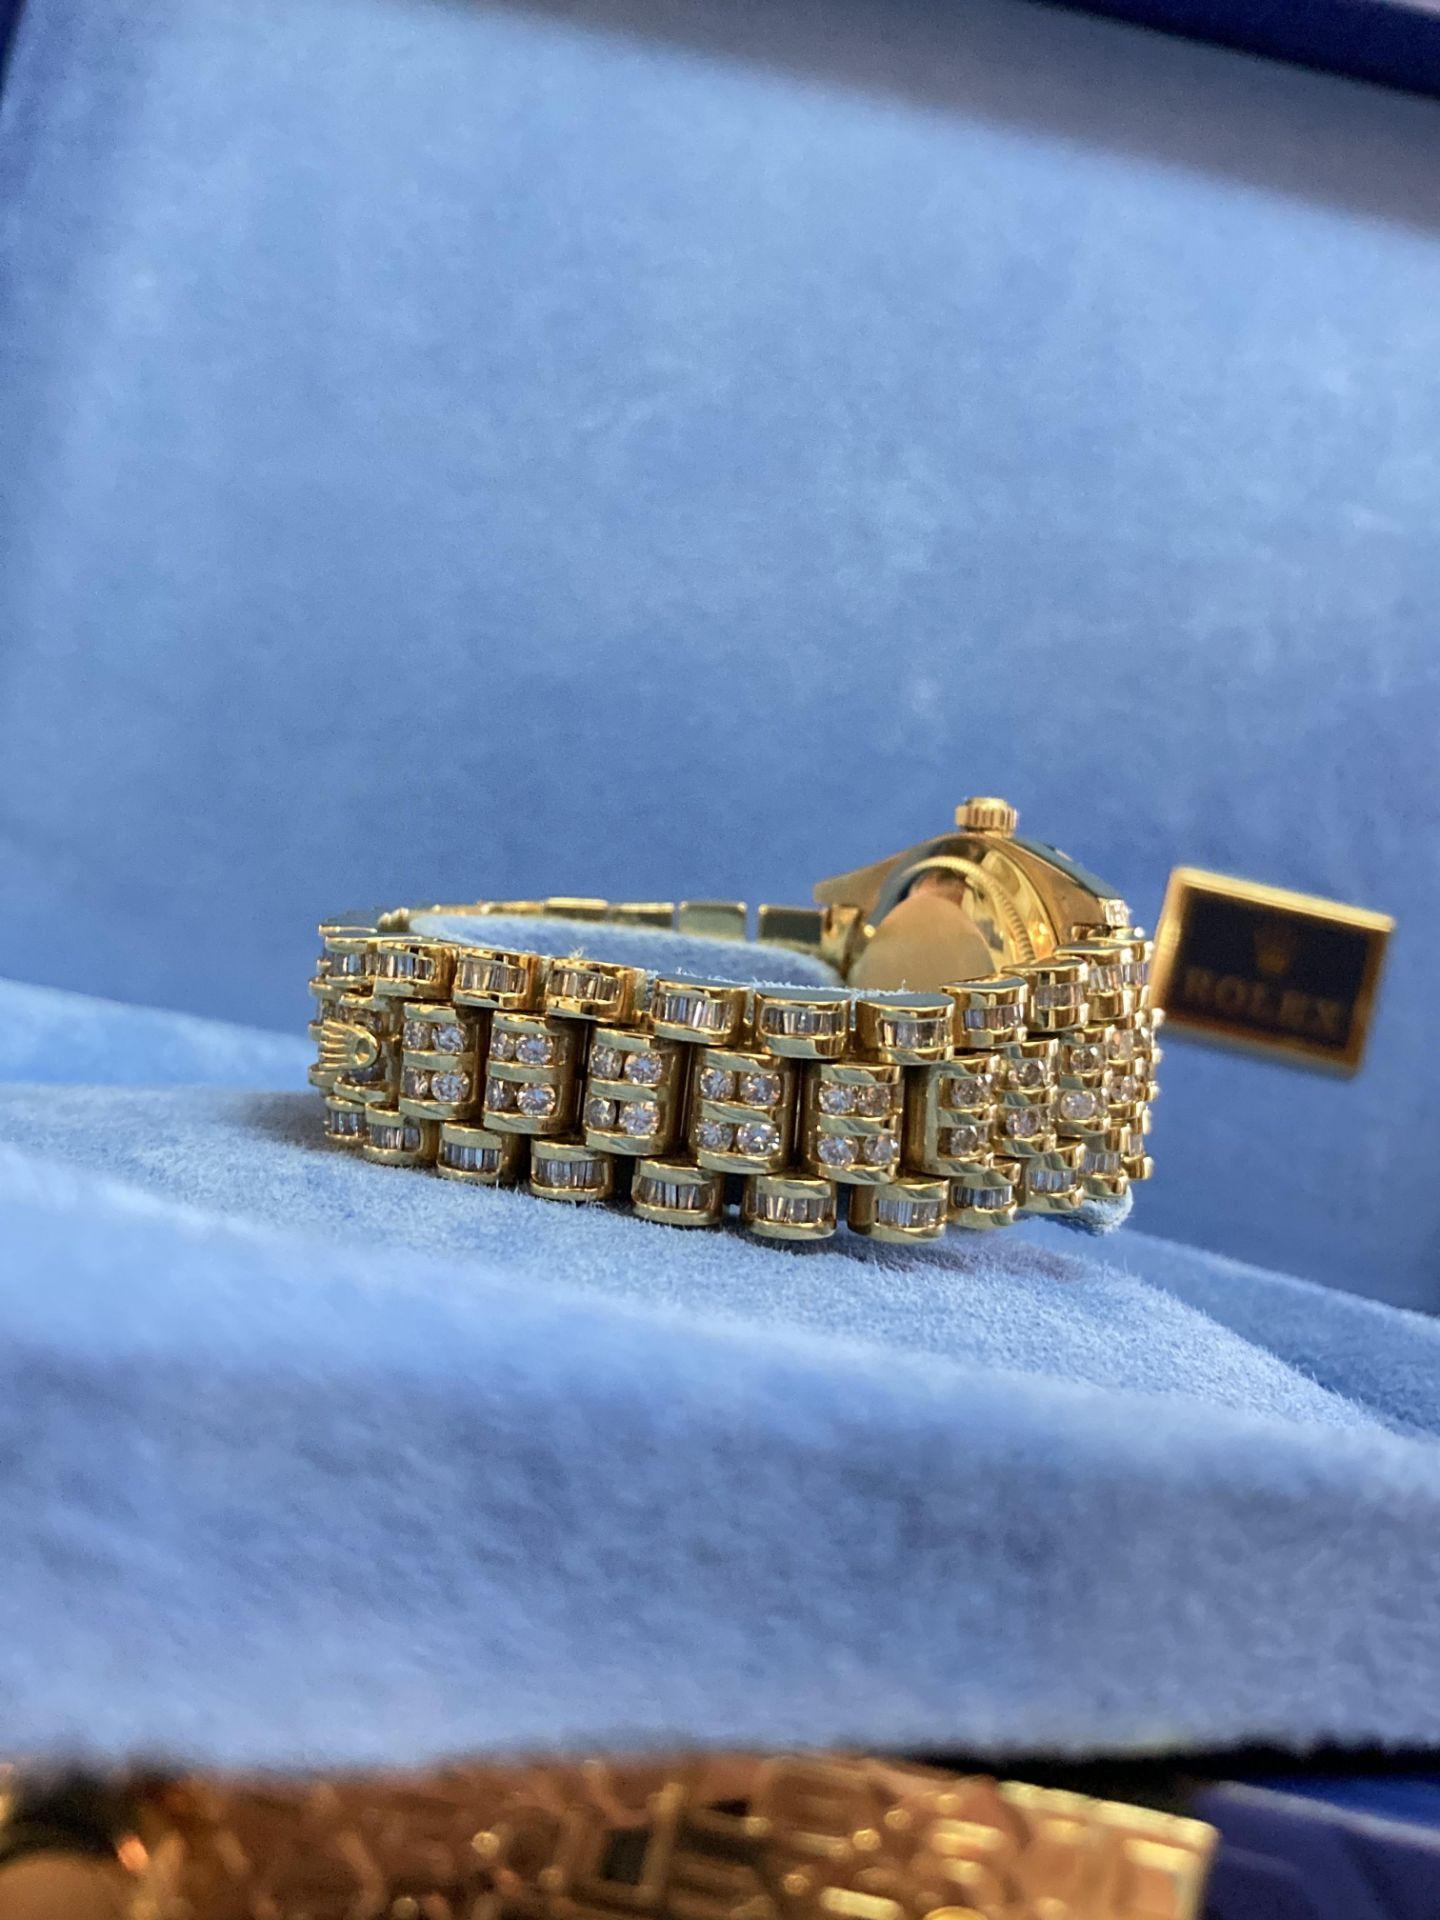 GENTS 36mm ROLEX DAYDATE YELLOW GOLD DIAMOND WATCH - Image 11 of 21